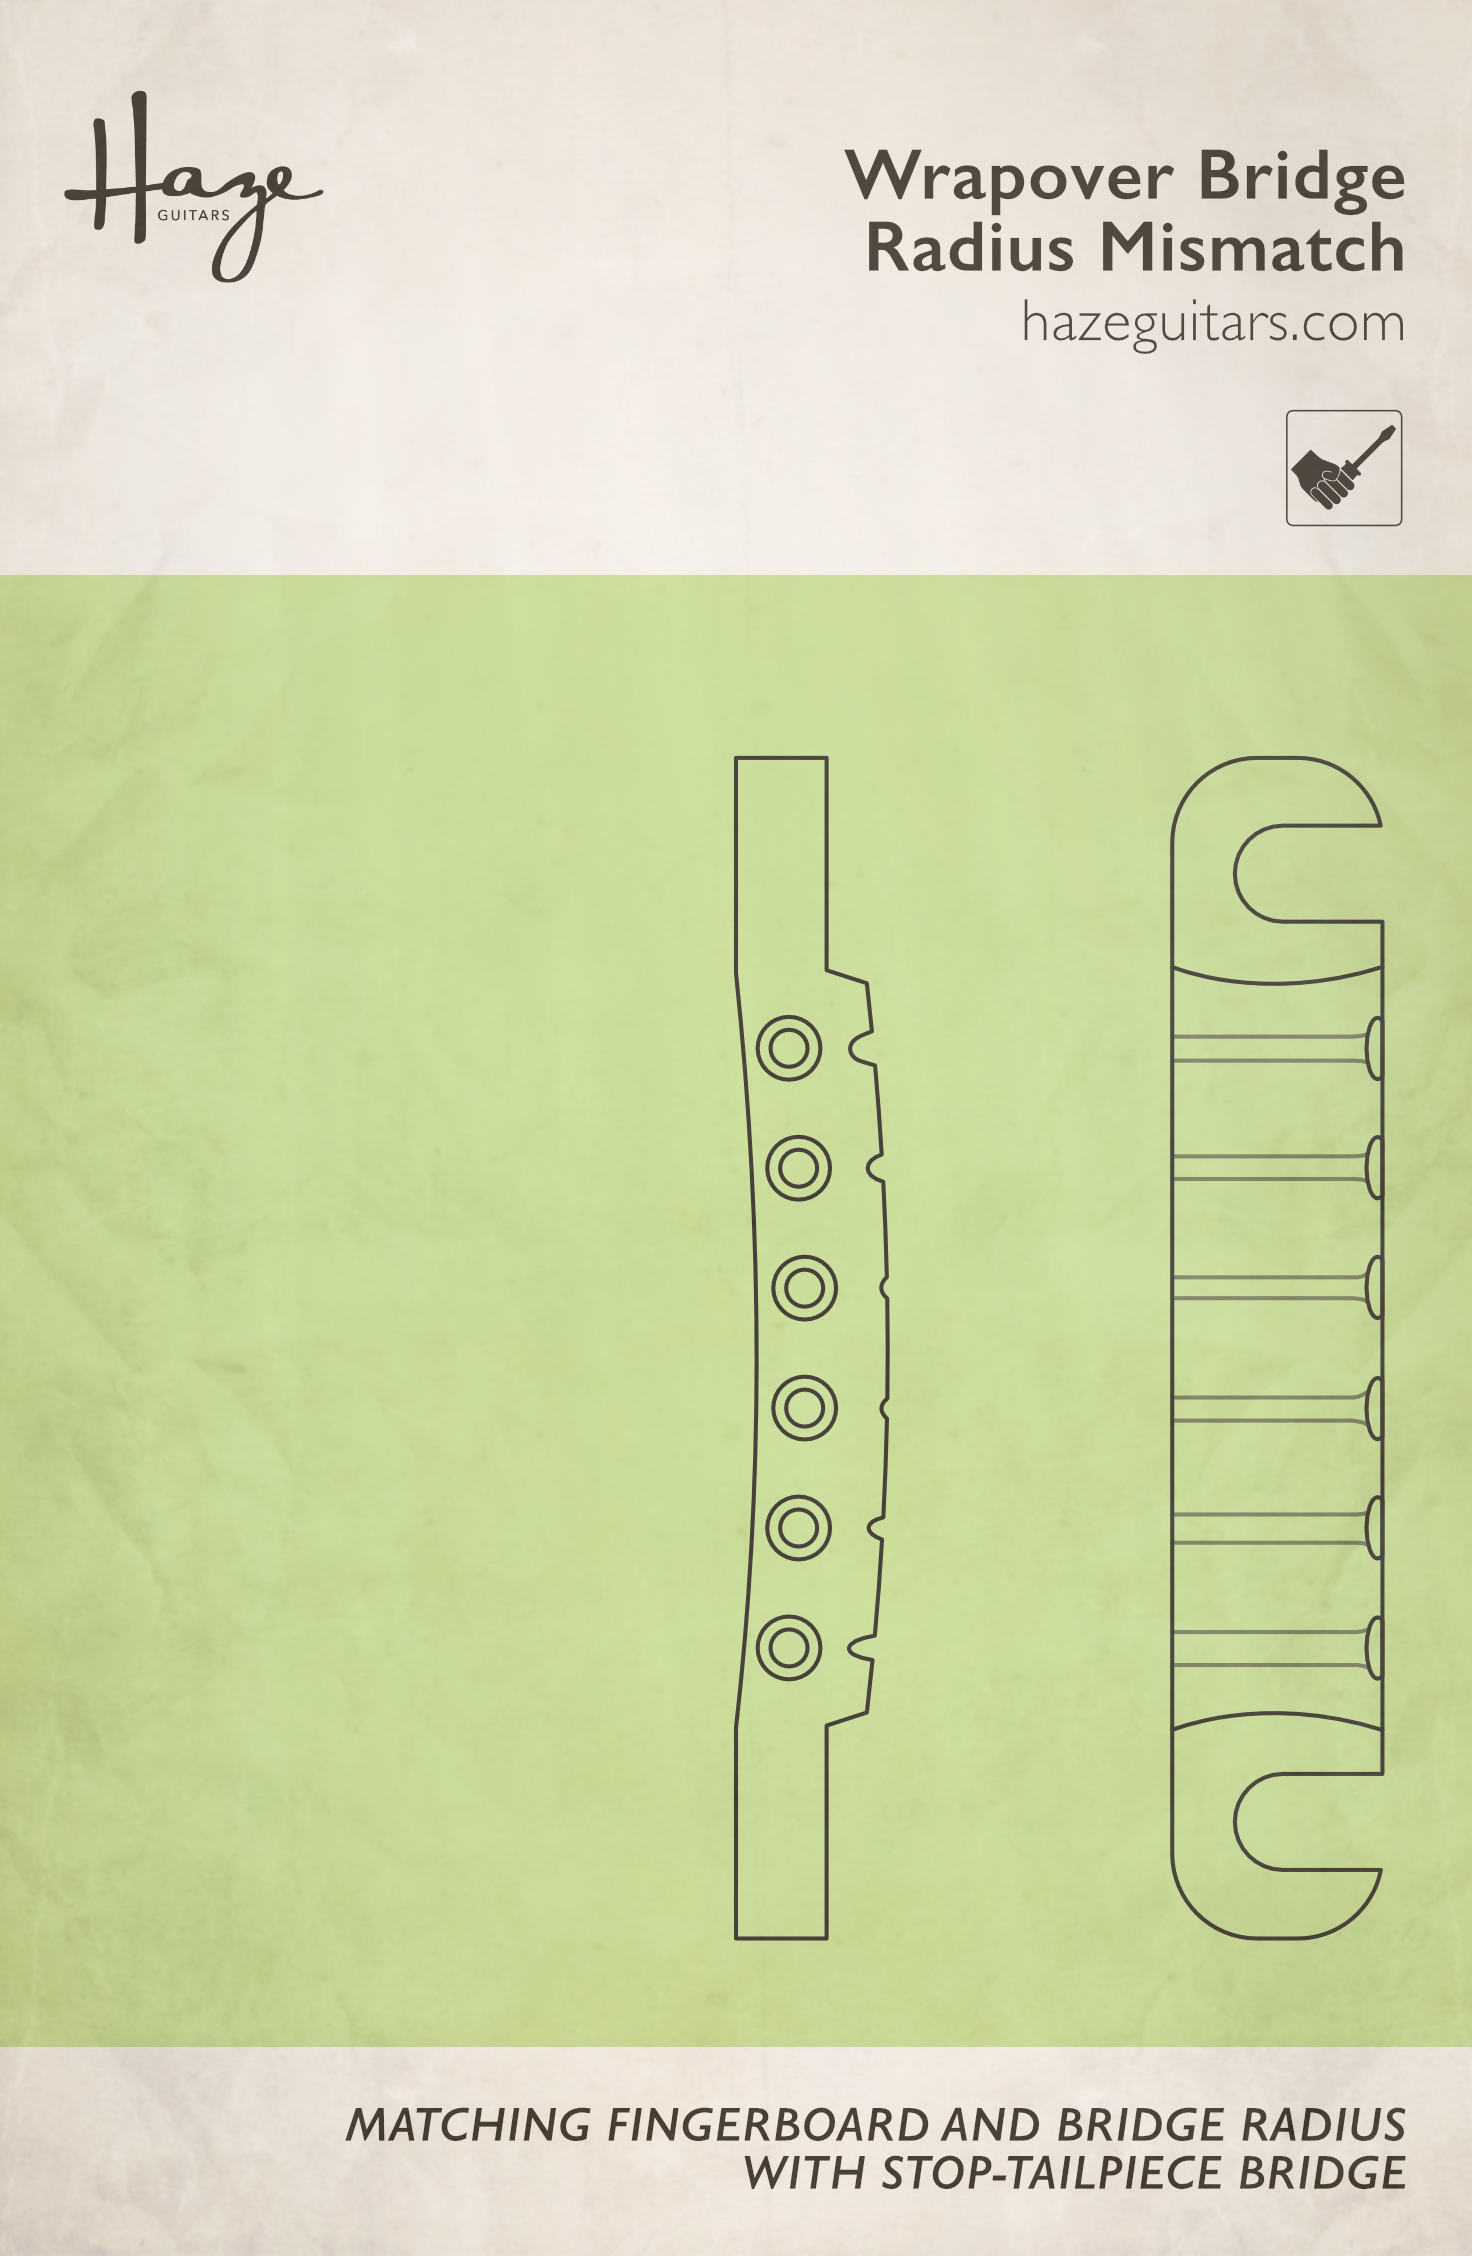 Matching fingerboard and bridge radius with a wraparound bridge